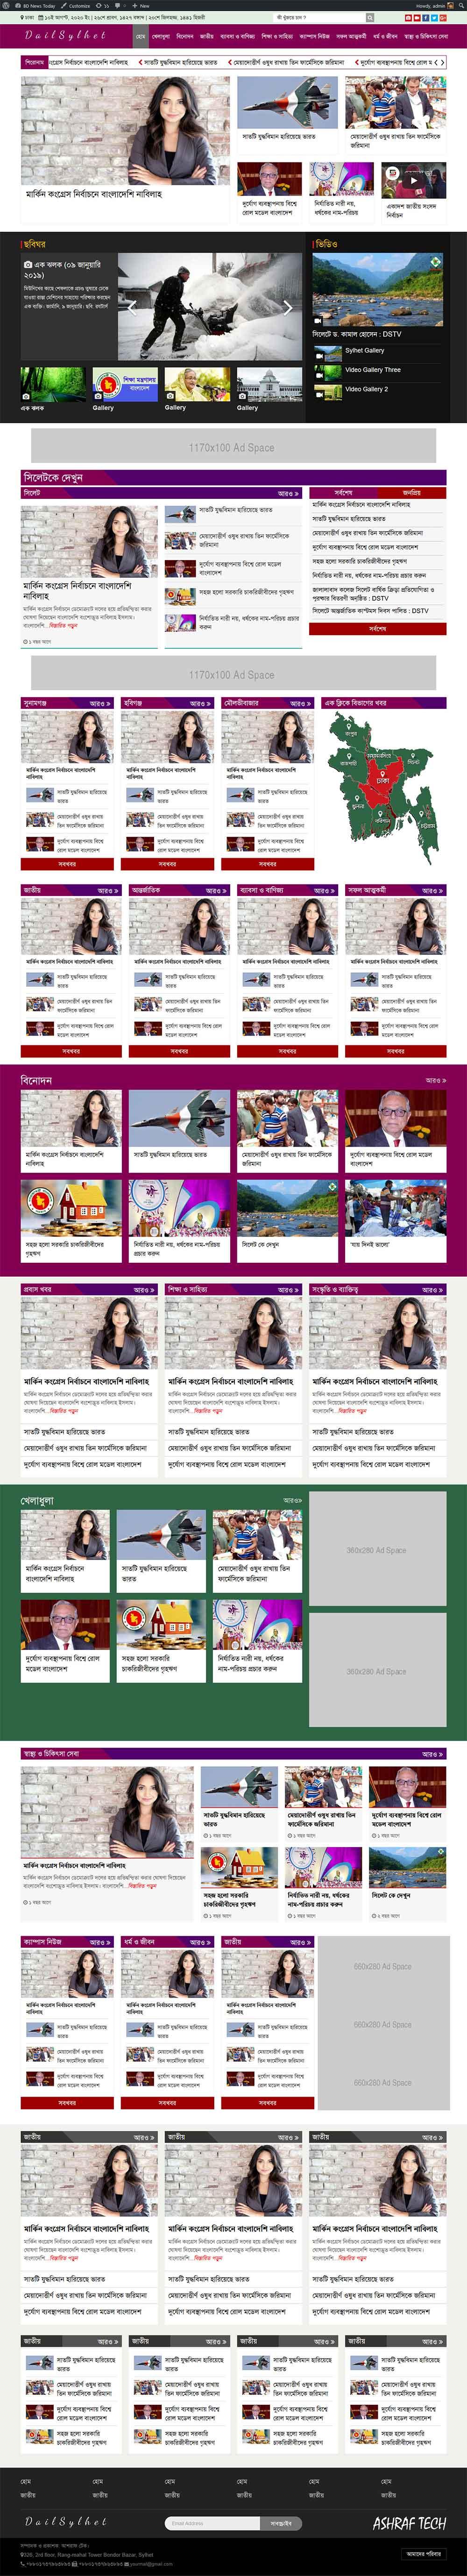 WordPress News Theme (Wonderful News)